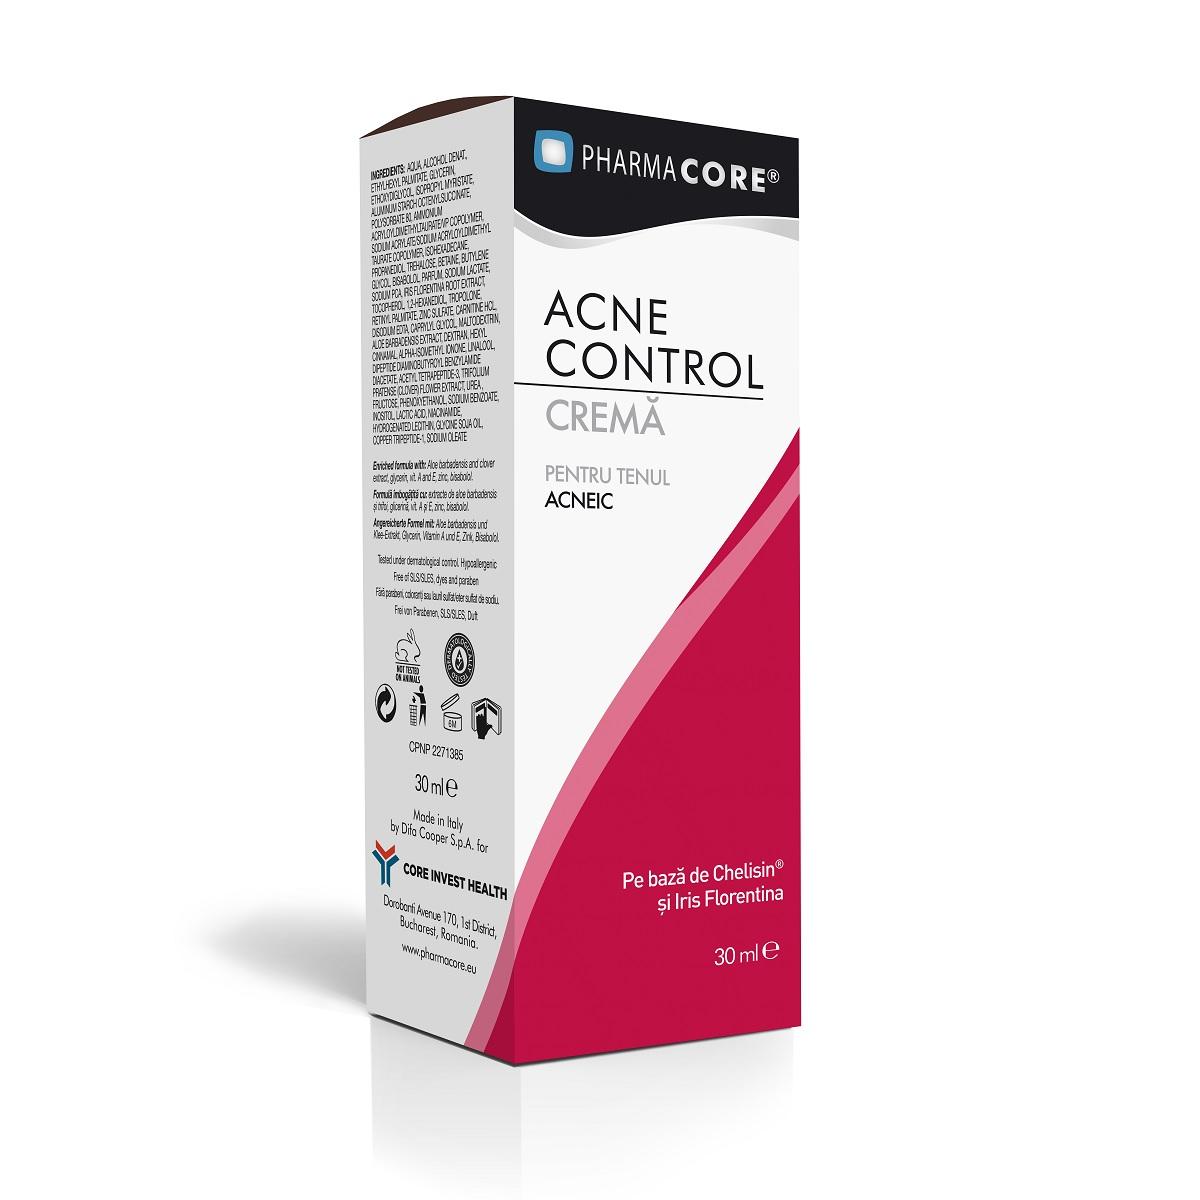 Crema tratament Acne Control, 30ml, Pharmacore drmax.ro